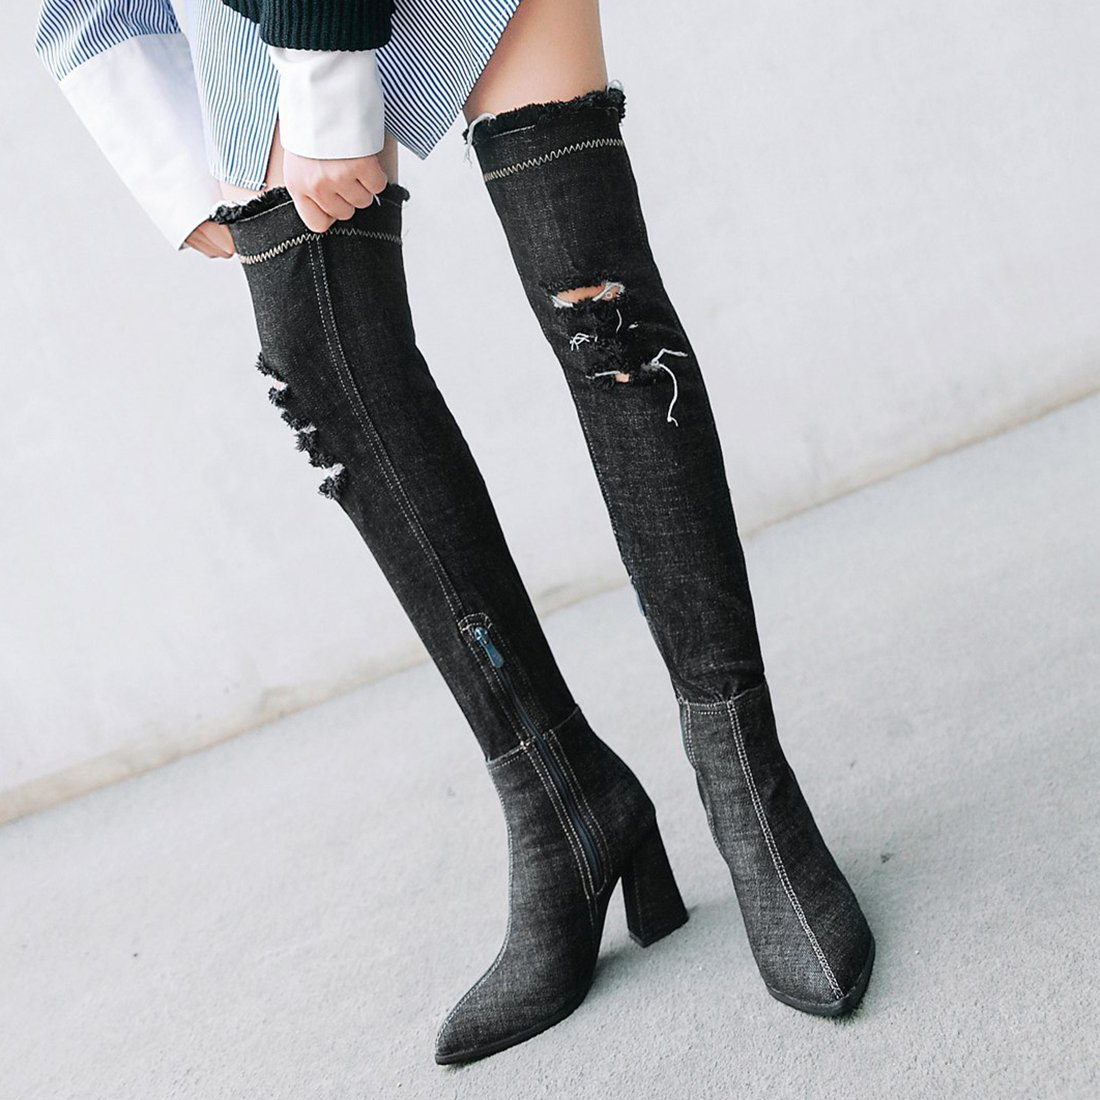 5e9ed0e5d1a5e Artfaerie Women s Fashion Denim Over Knee Boots Pointed Toe Block High Heel Thigh  High Boots  Amazon.co.uk  Shoes   Bags